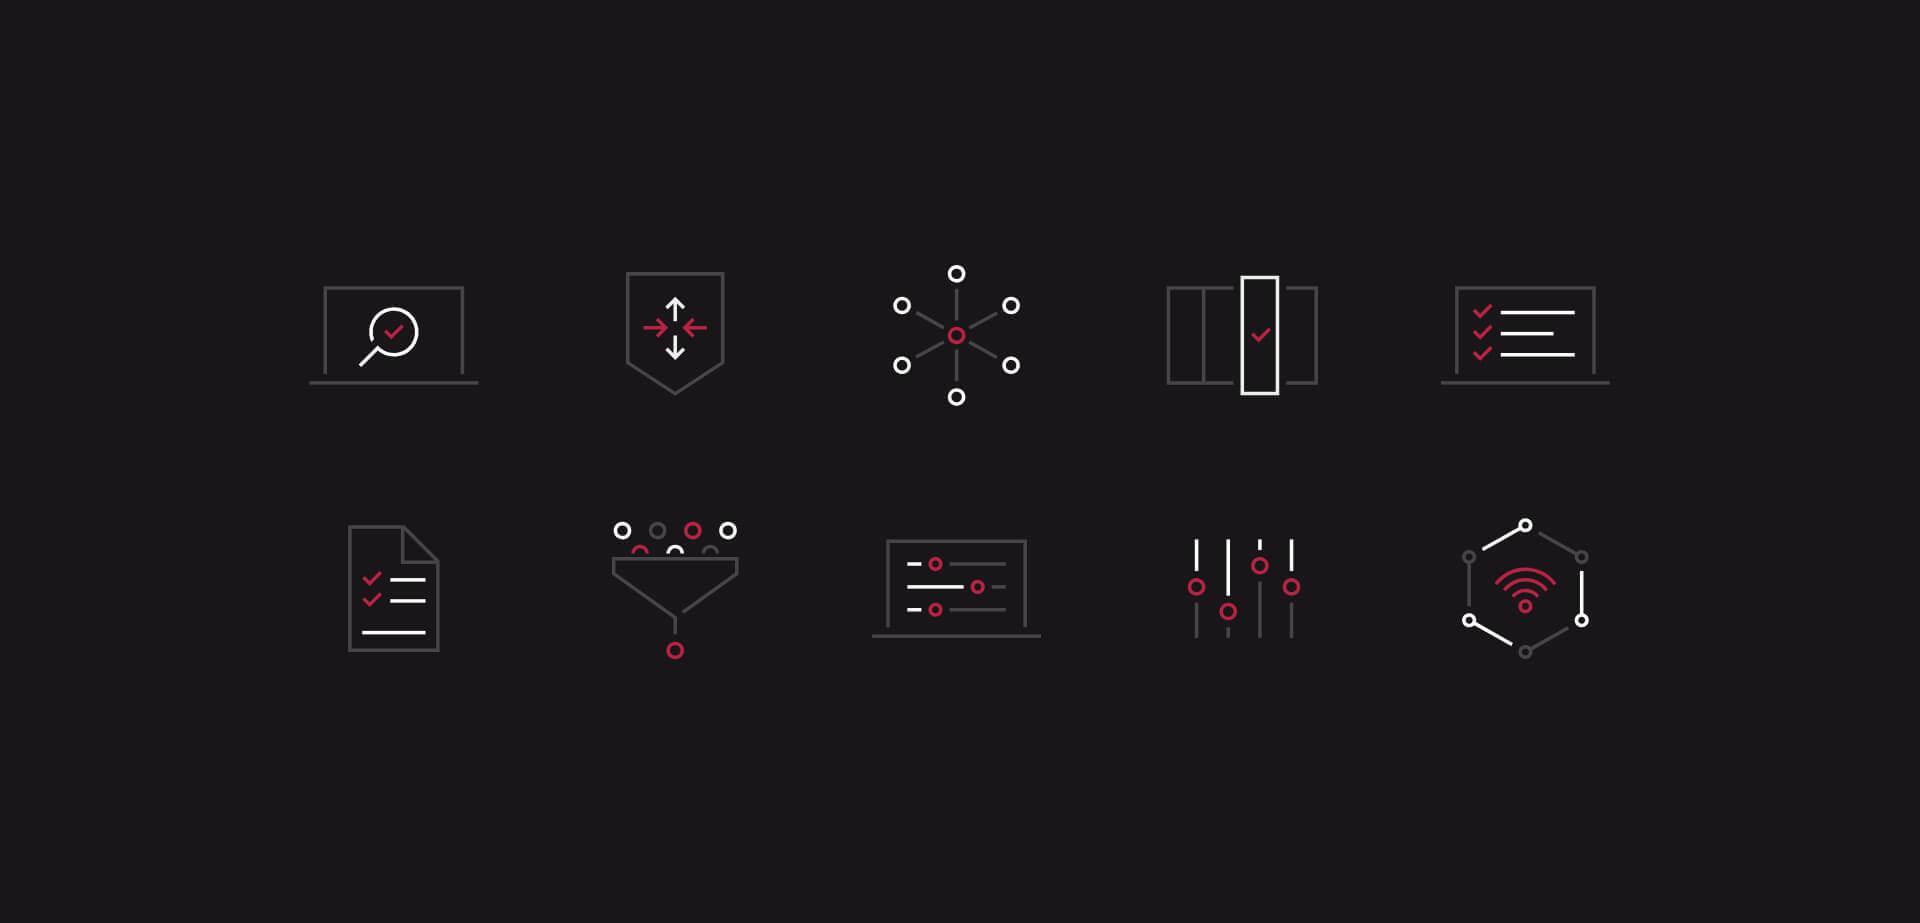 Dominik-Pacholczyk-Brand-Idenity-Design-Consultancy-ITORO-21